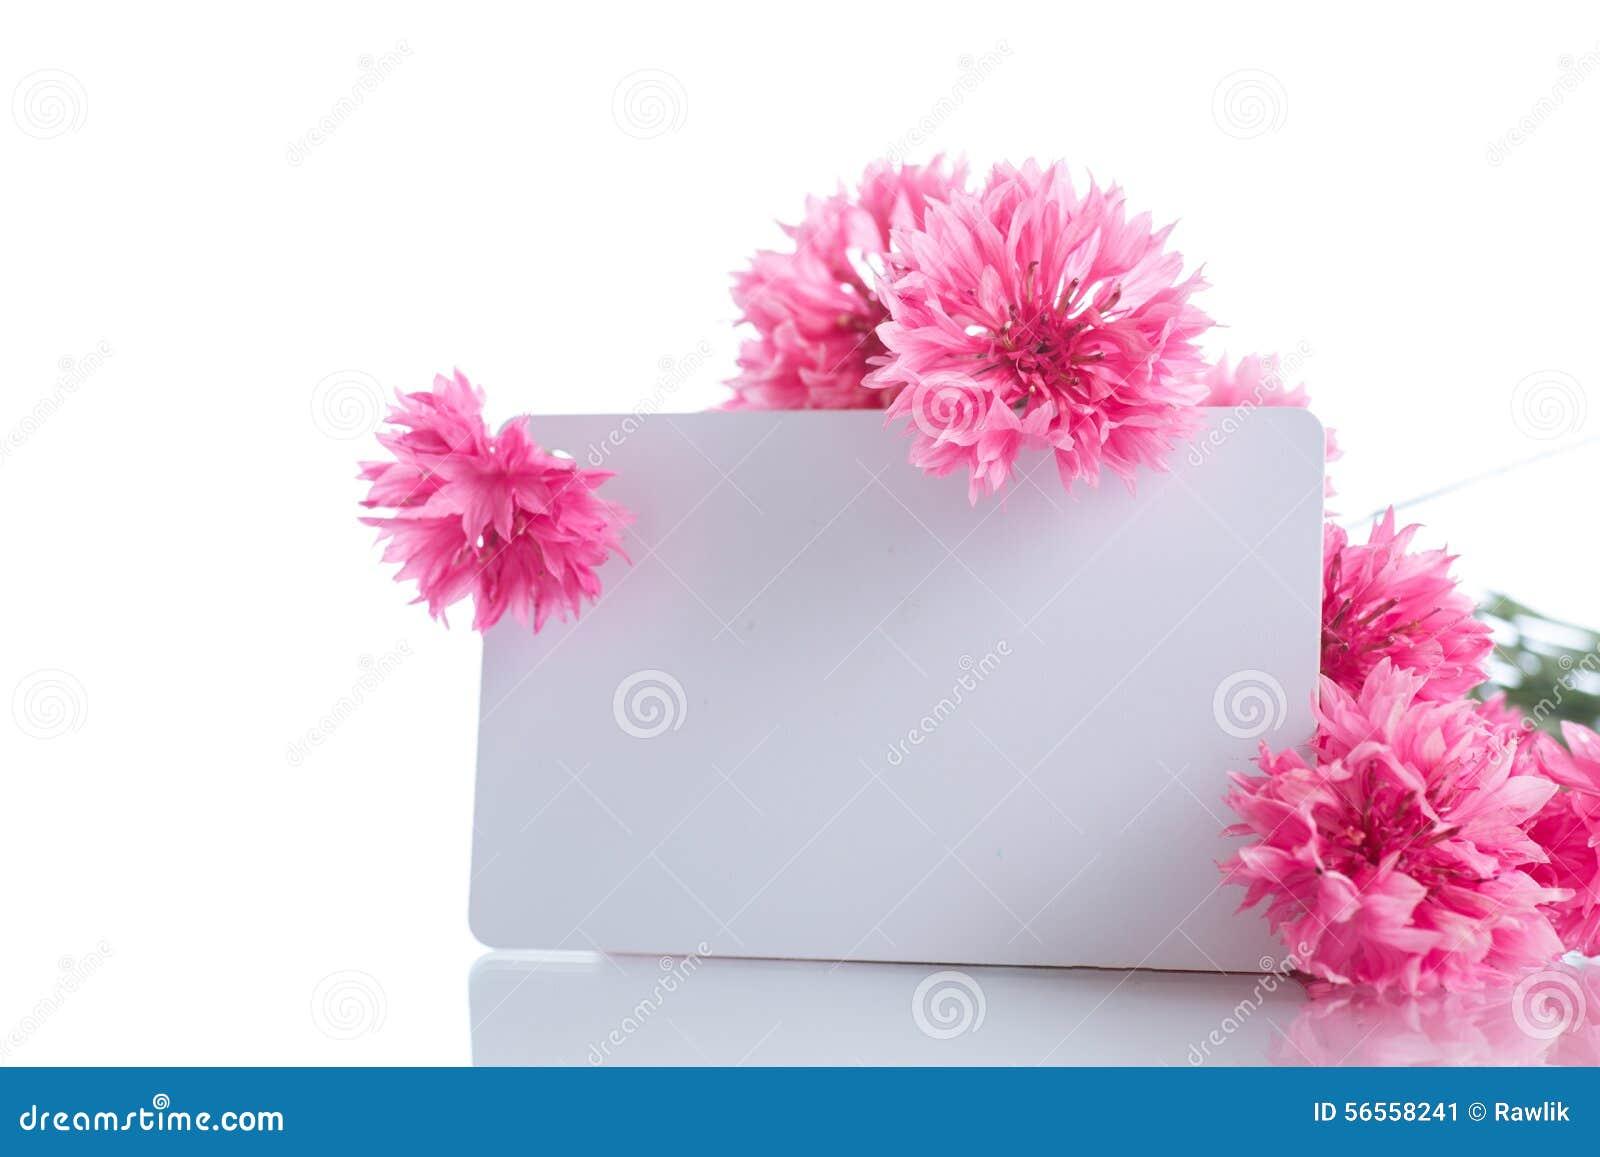 Download Φωτεινή ανθοδέσμη των γαρίφαλων Στοκ Εικόνα - εικόνα από αγάπη, ανασκόπησης: 56558241